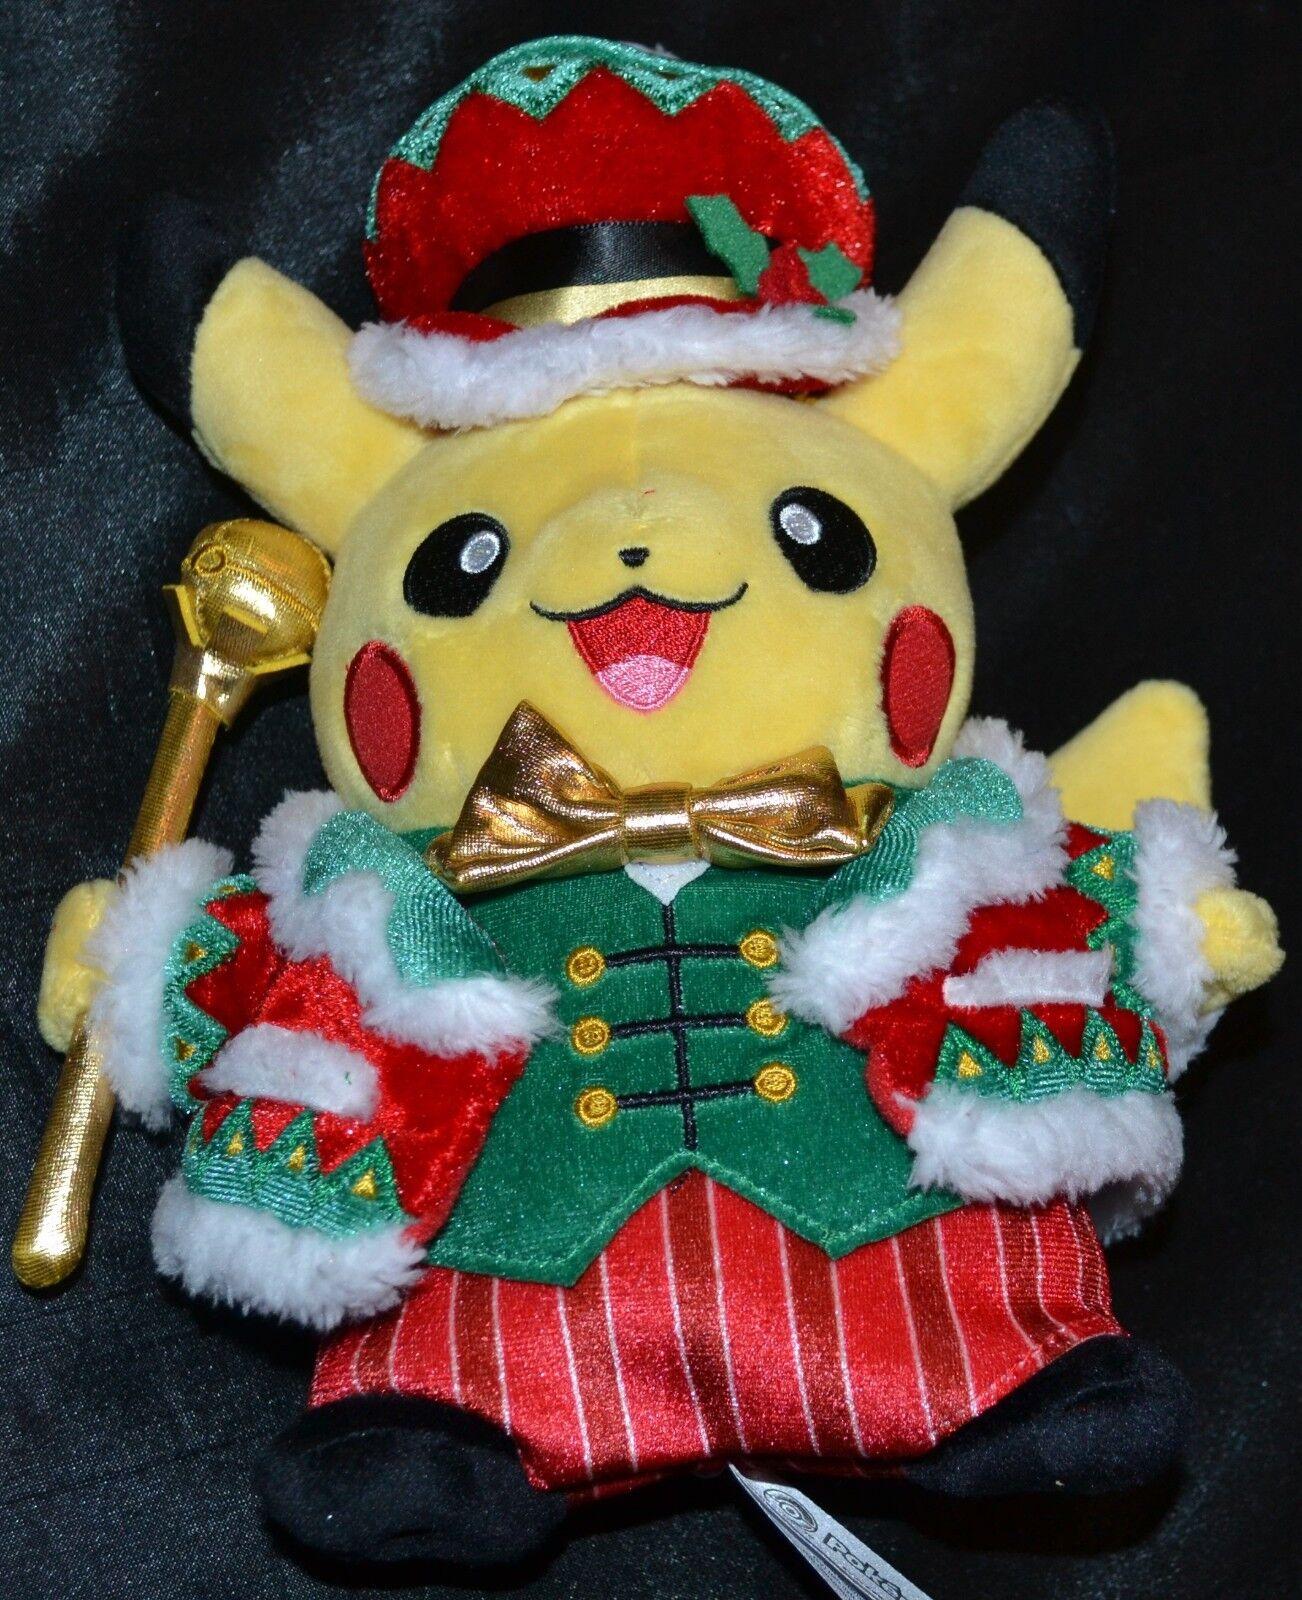 9.5  Christmas Pikachu Official Pokemon Center Poke Plush Dolls Toys Xmas Gifts